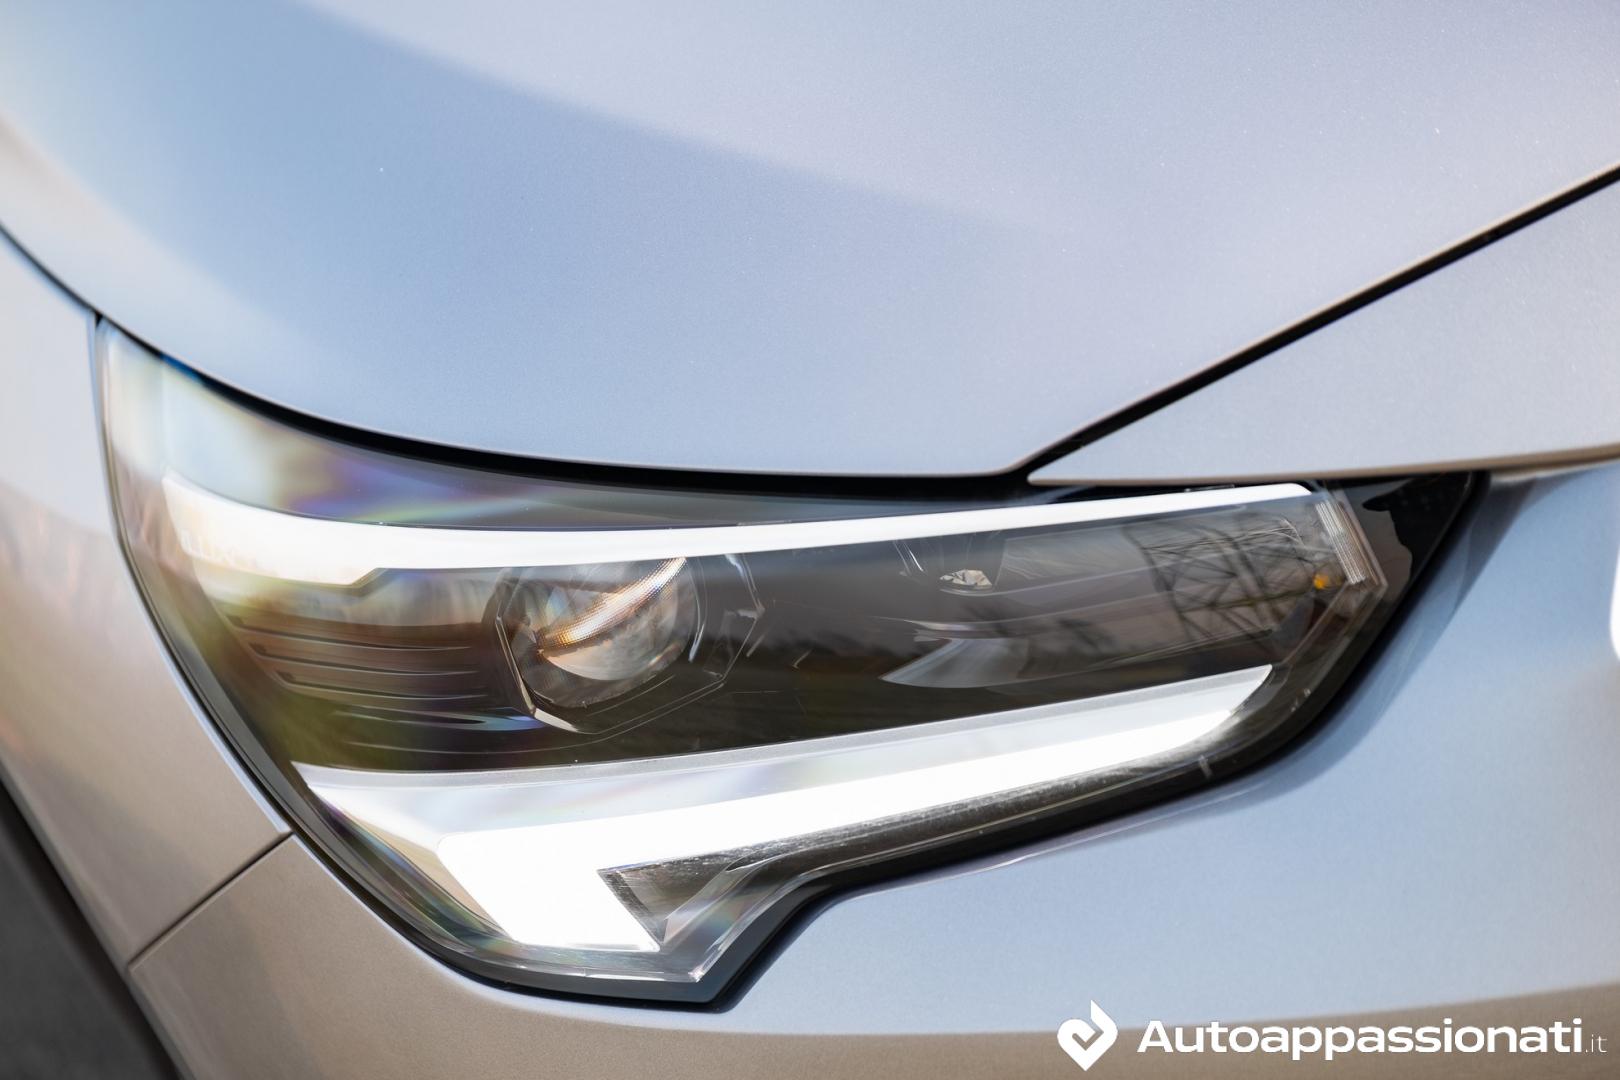 Opel Corsa Diesel fari intellilux led